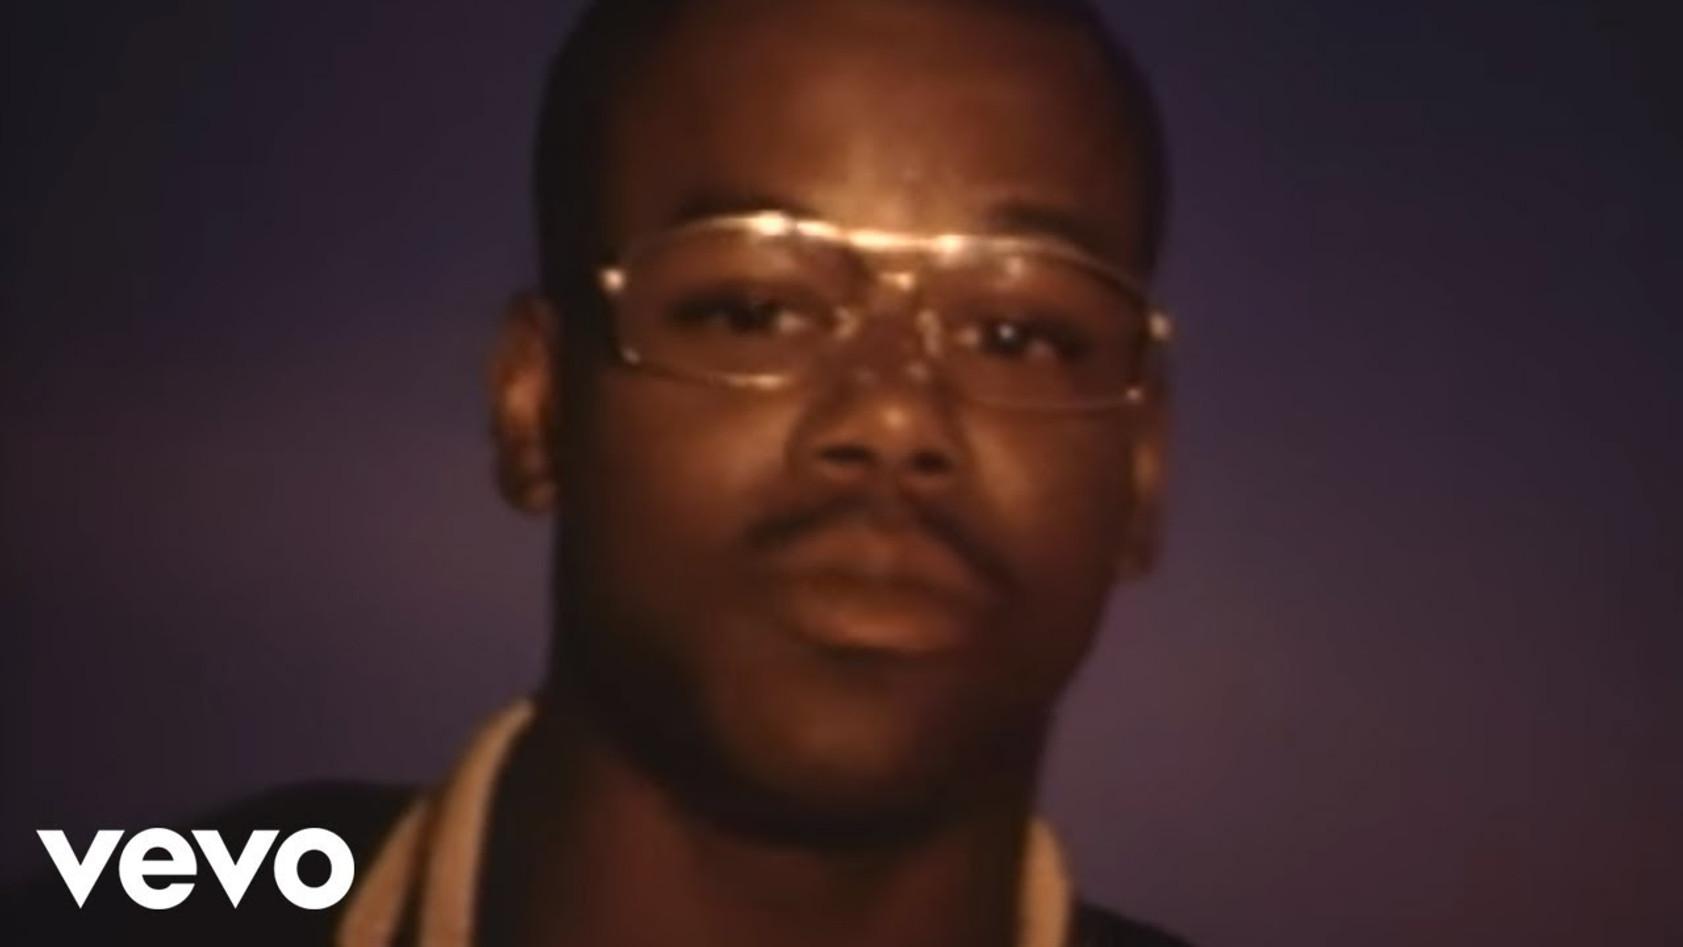 West Coast Hip Hop Bangerz 1990-1995